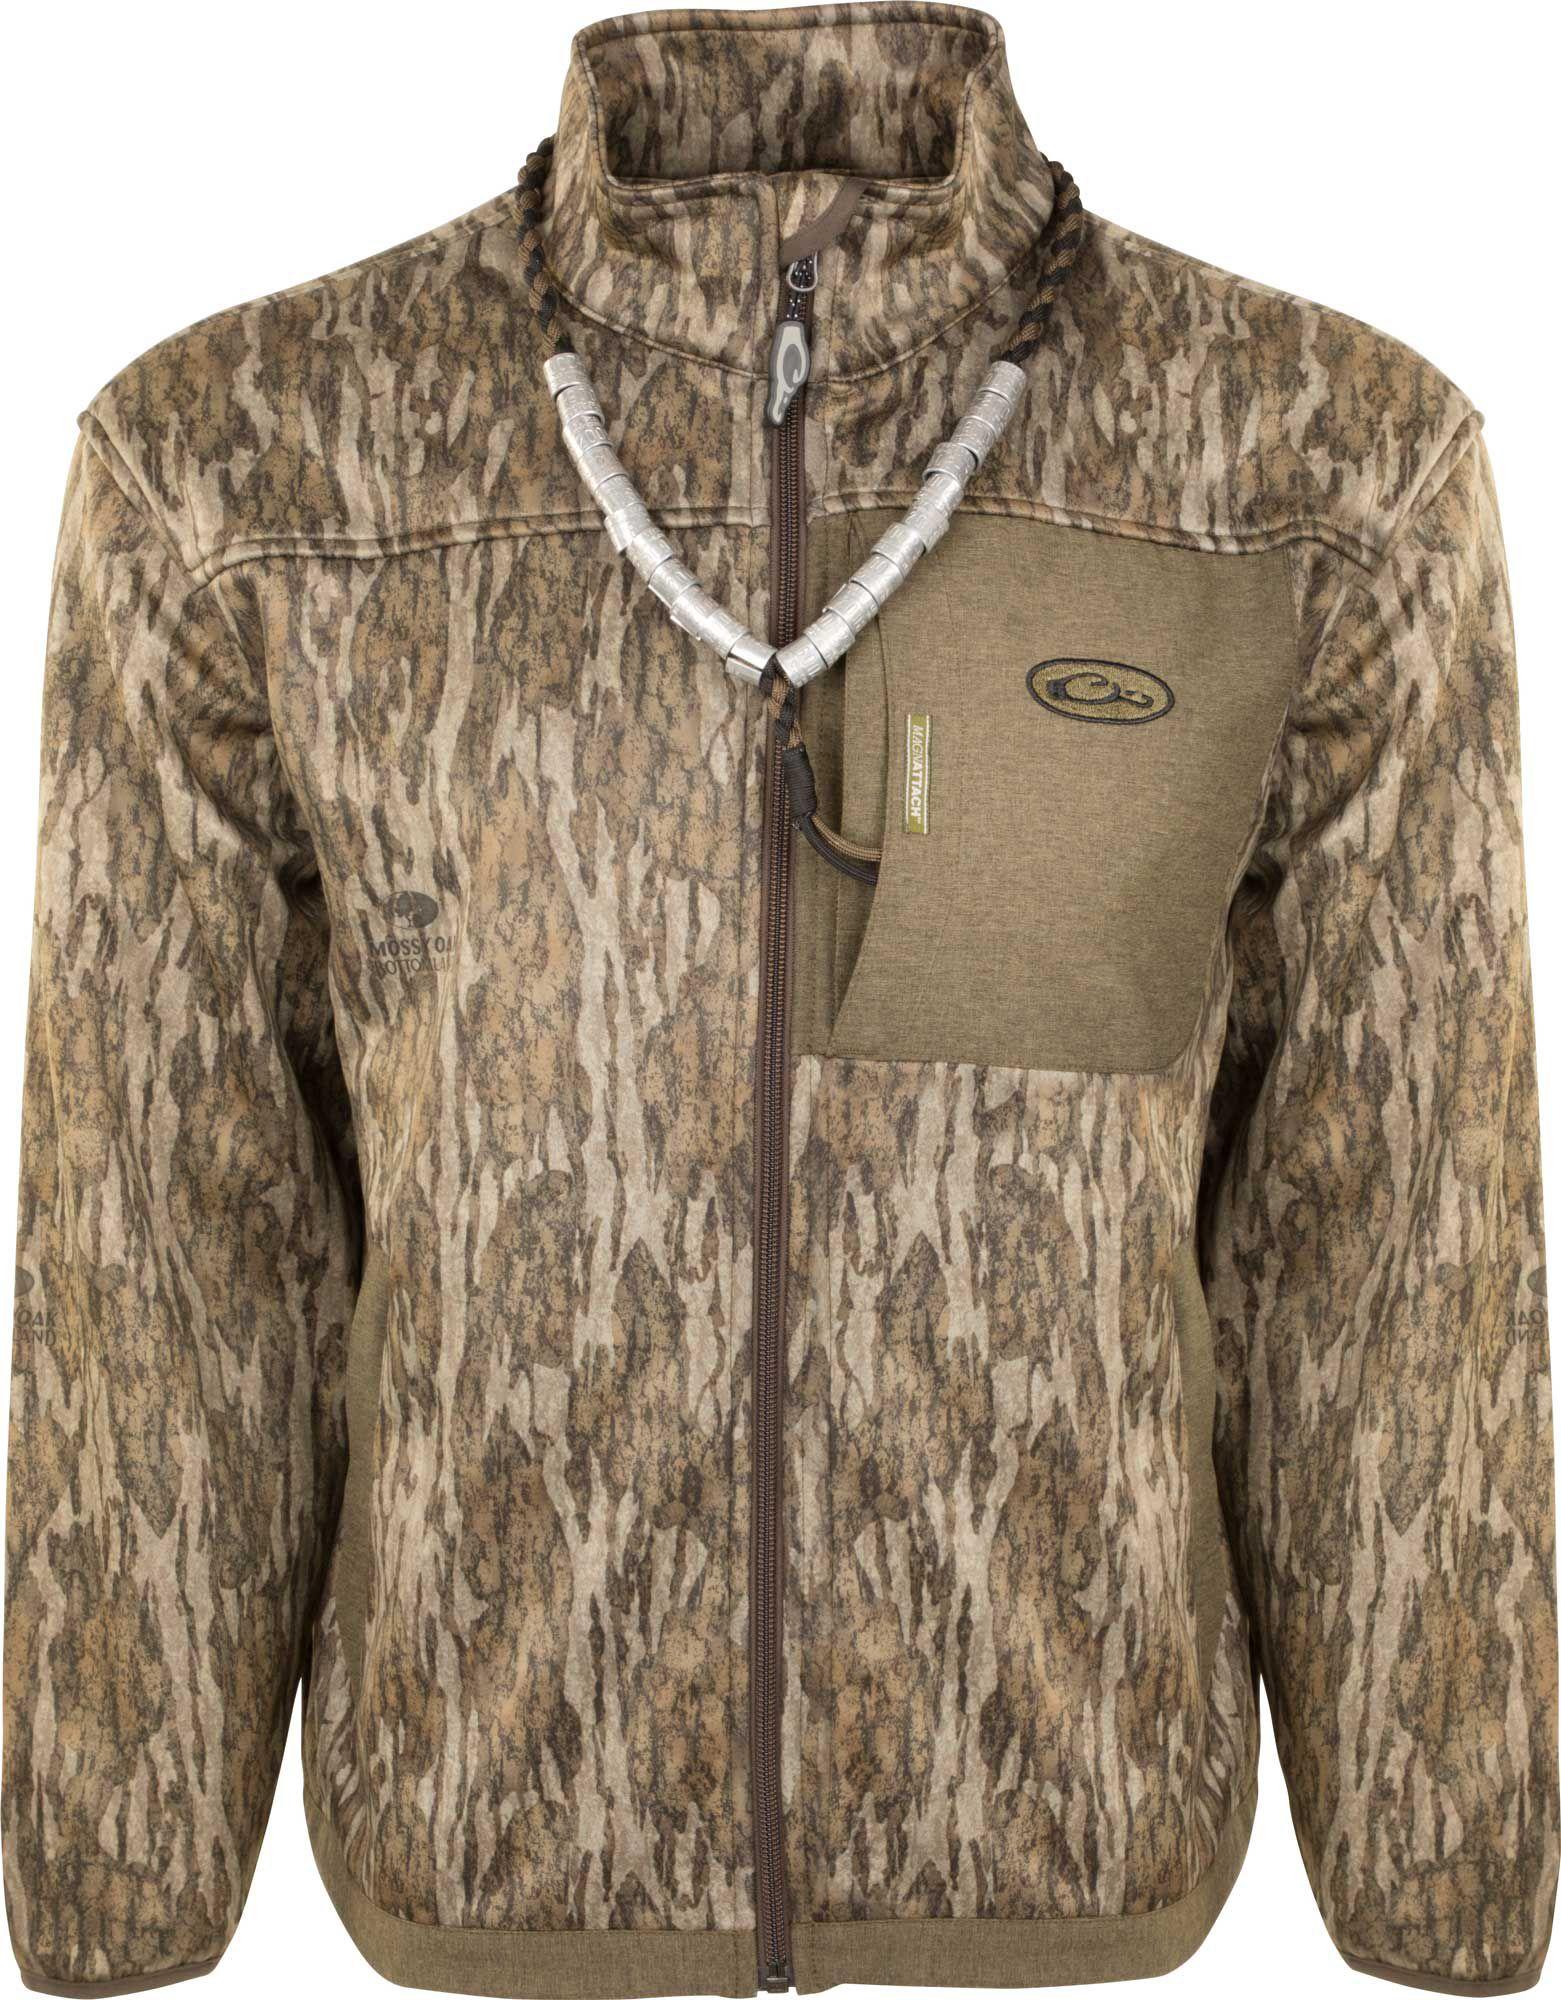 Drake Waterfowl Men's MST Quarter Zip Hunting Jacket, Size: Small, Brown